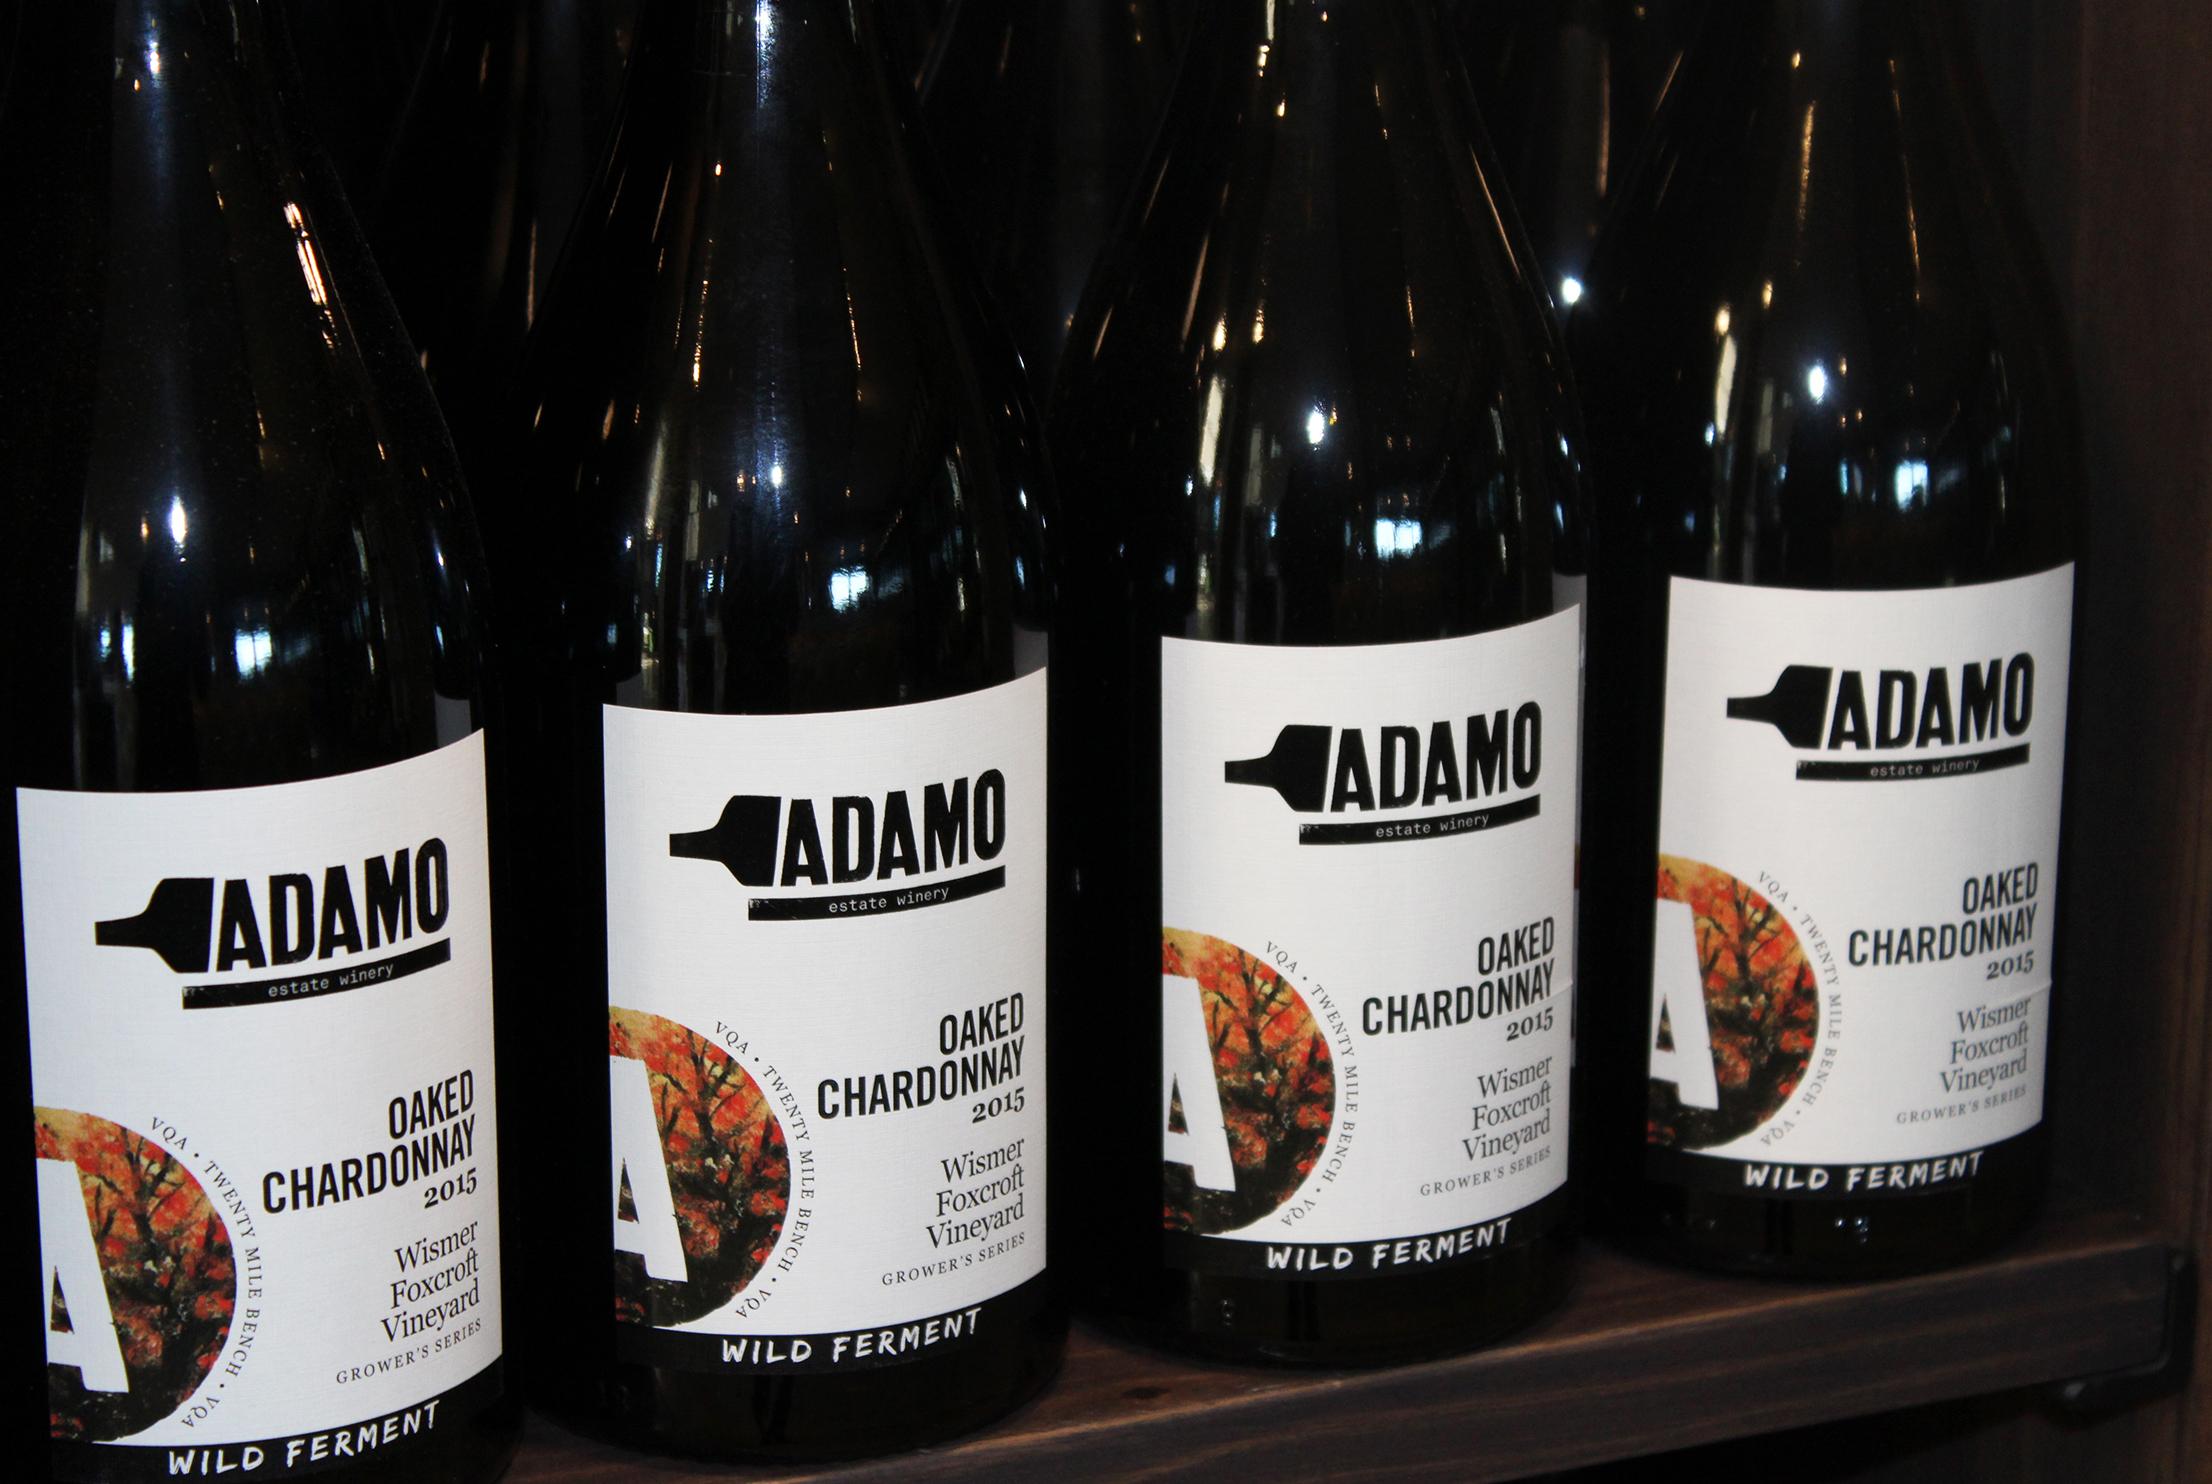 New Release: 2015 Wild Ferment Oaked Chardonnay